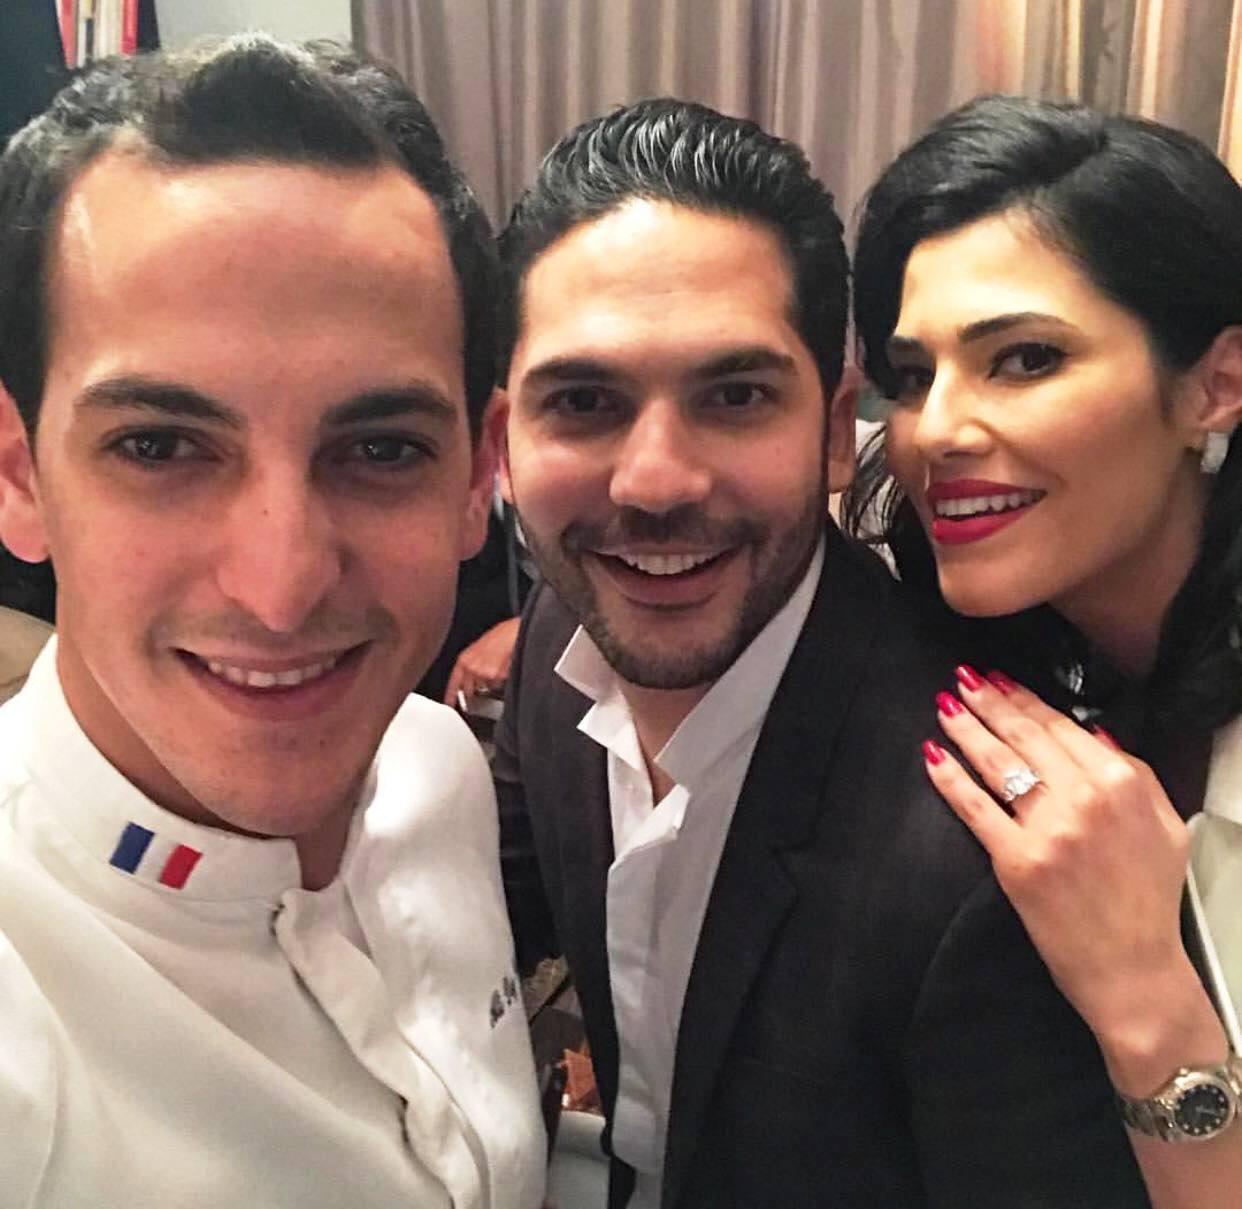 Maram Ben Aziza en compagnie de son fiancé et le chef cuisinier tunisien de renommée Ali Dey Daly